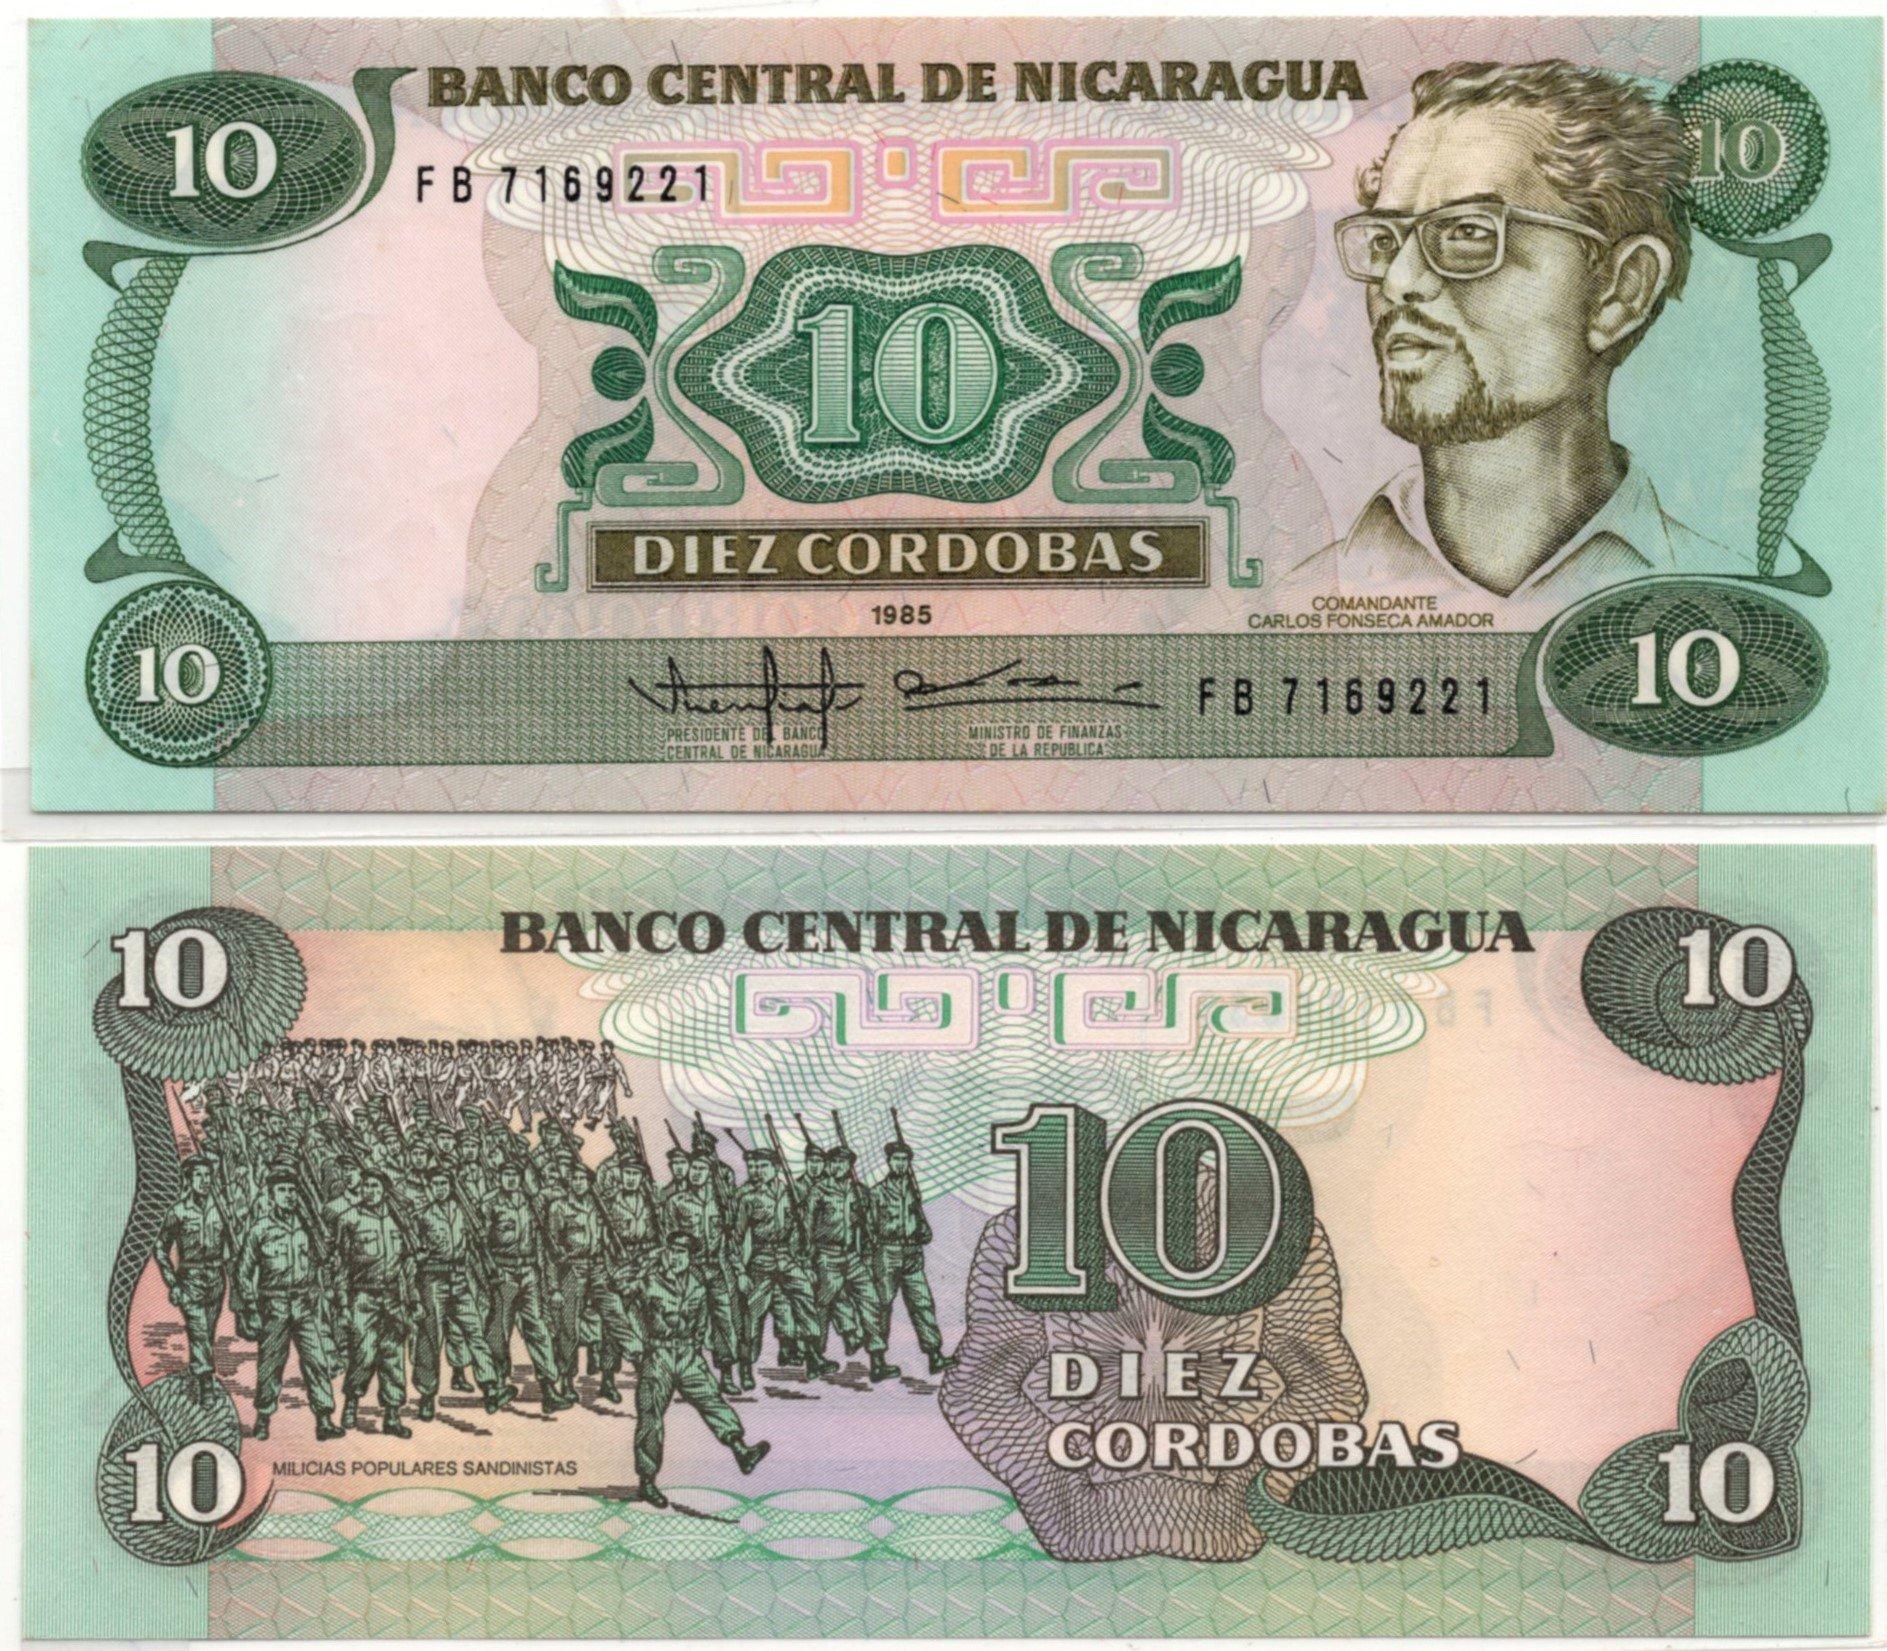 nuucaragua 10 cordoba 1985